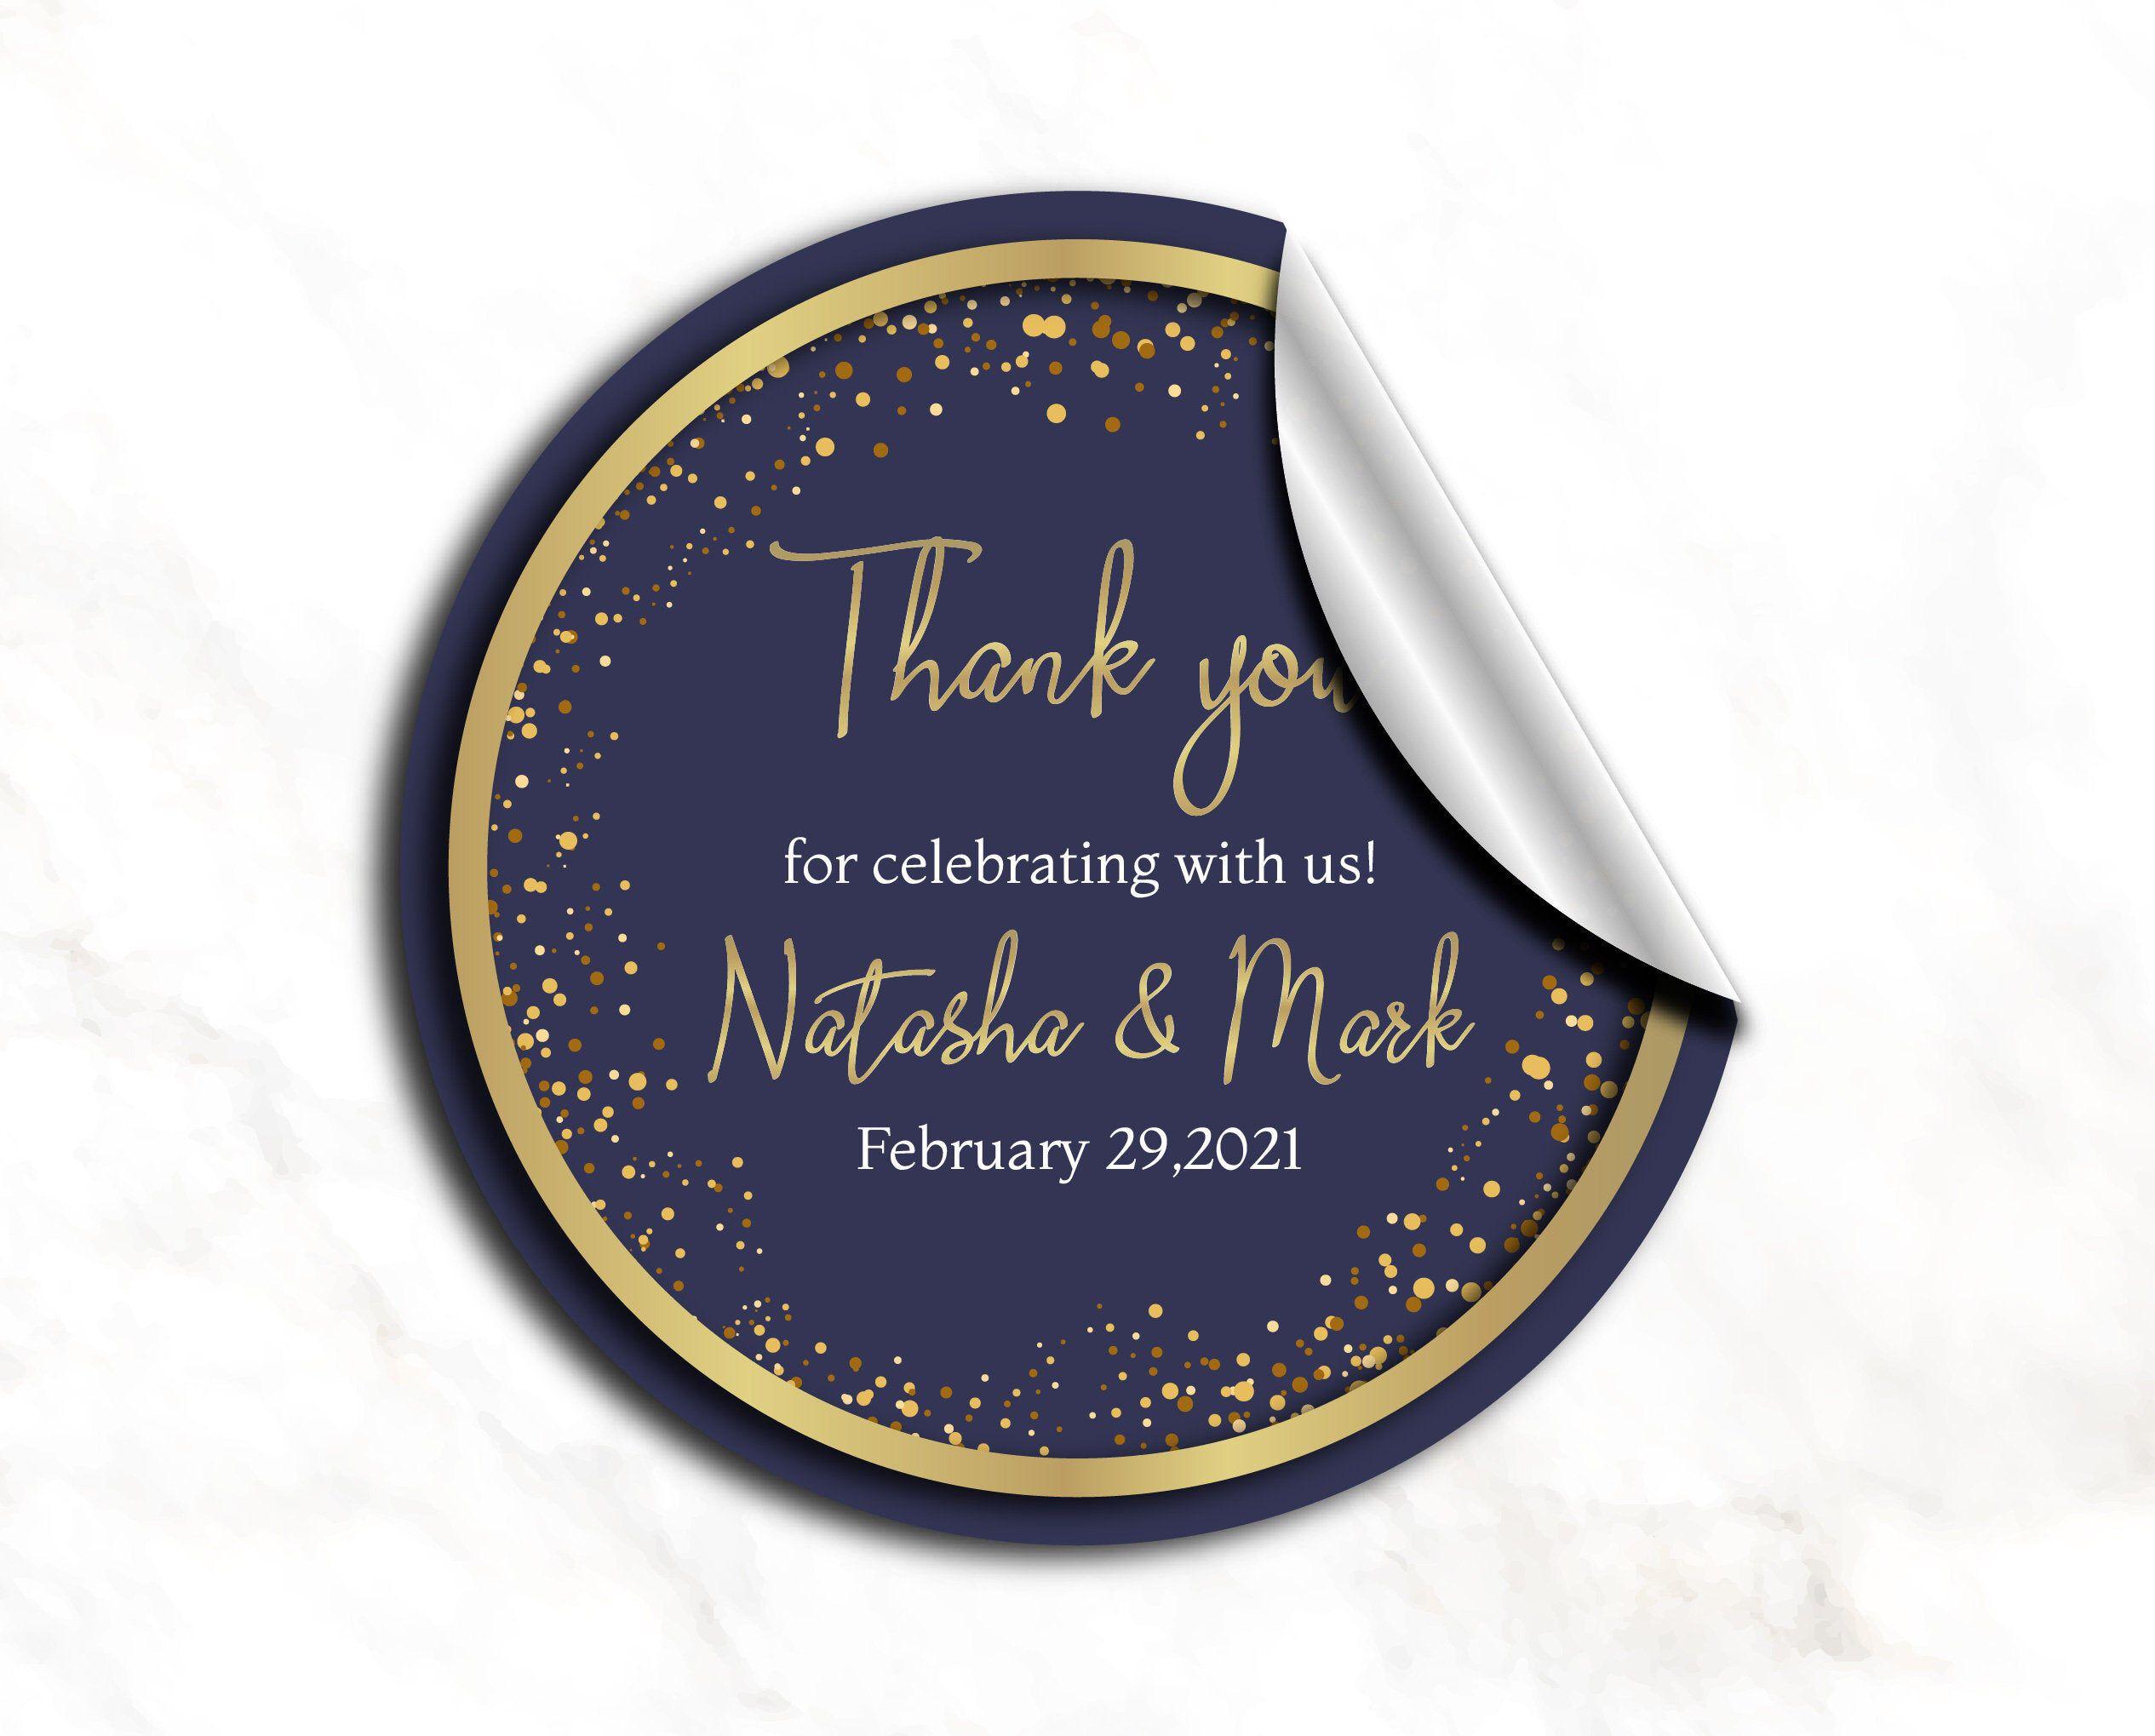 Gold Wedding Stickers Labels Wedding Stickers For Favors Etsy In 2020 Wedding Stickers Labels Wedding Stickers Personalized Wedding Labels